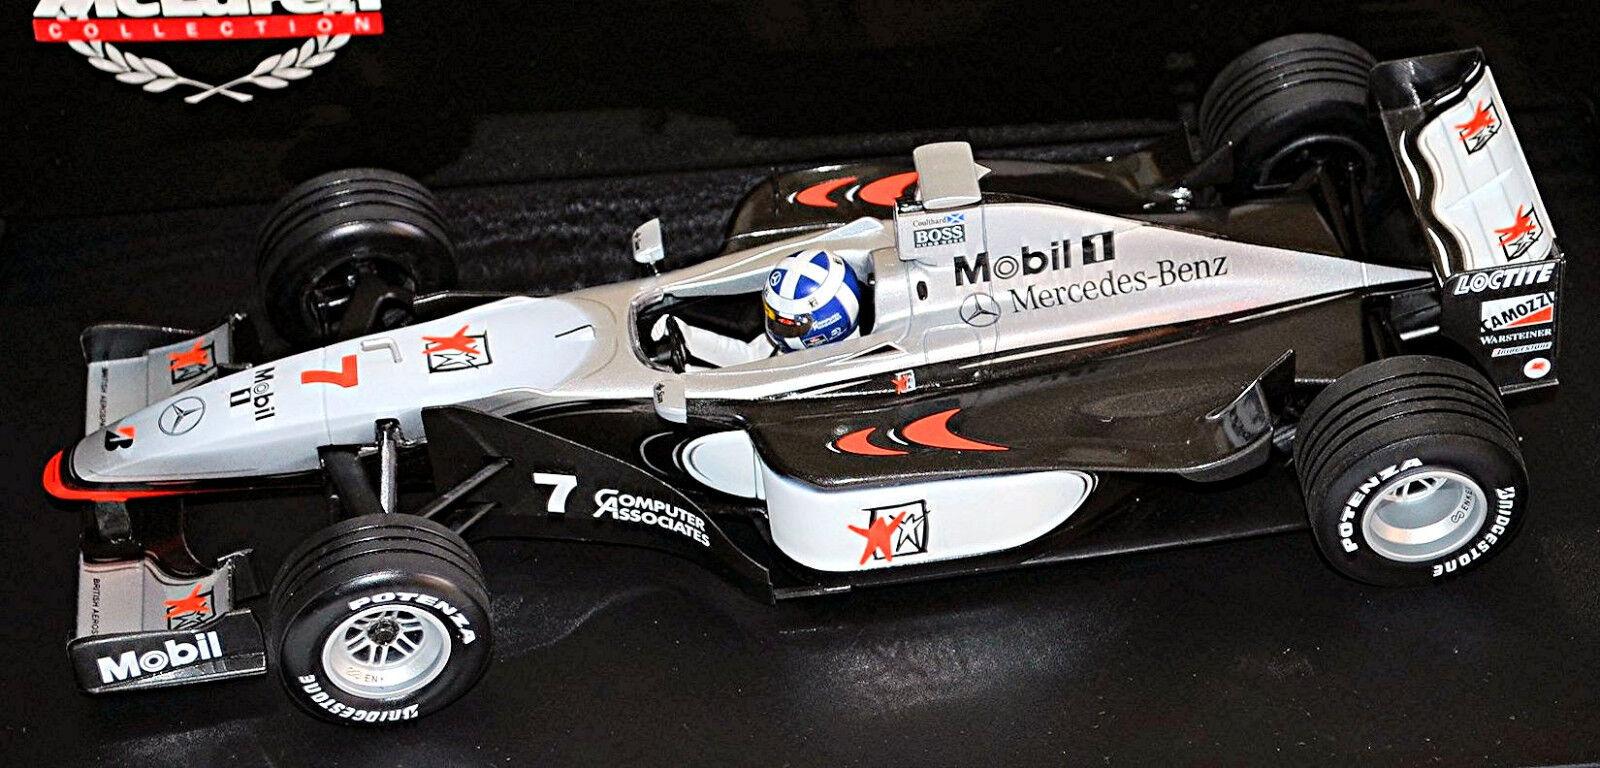 McLaren Mercedes mp4-13 1998 David Coulthard  7 - 1 18 Minichamps